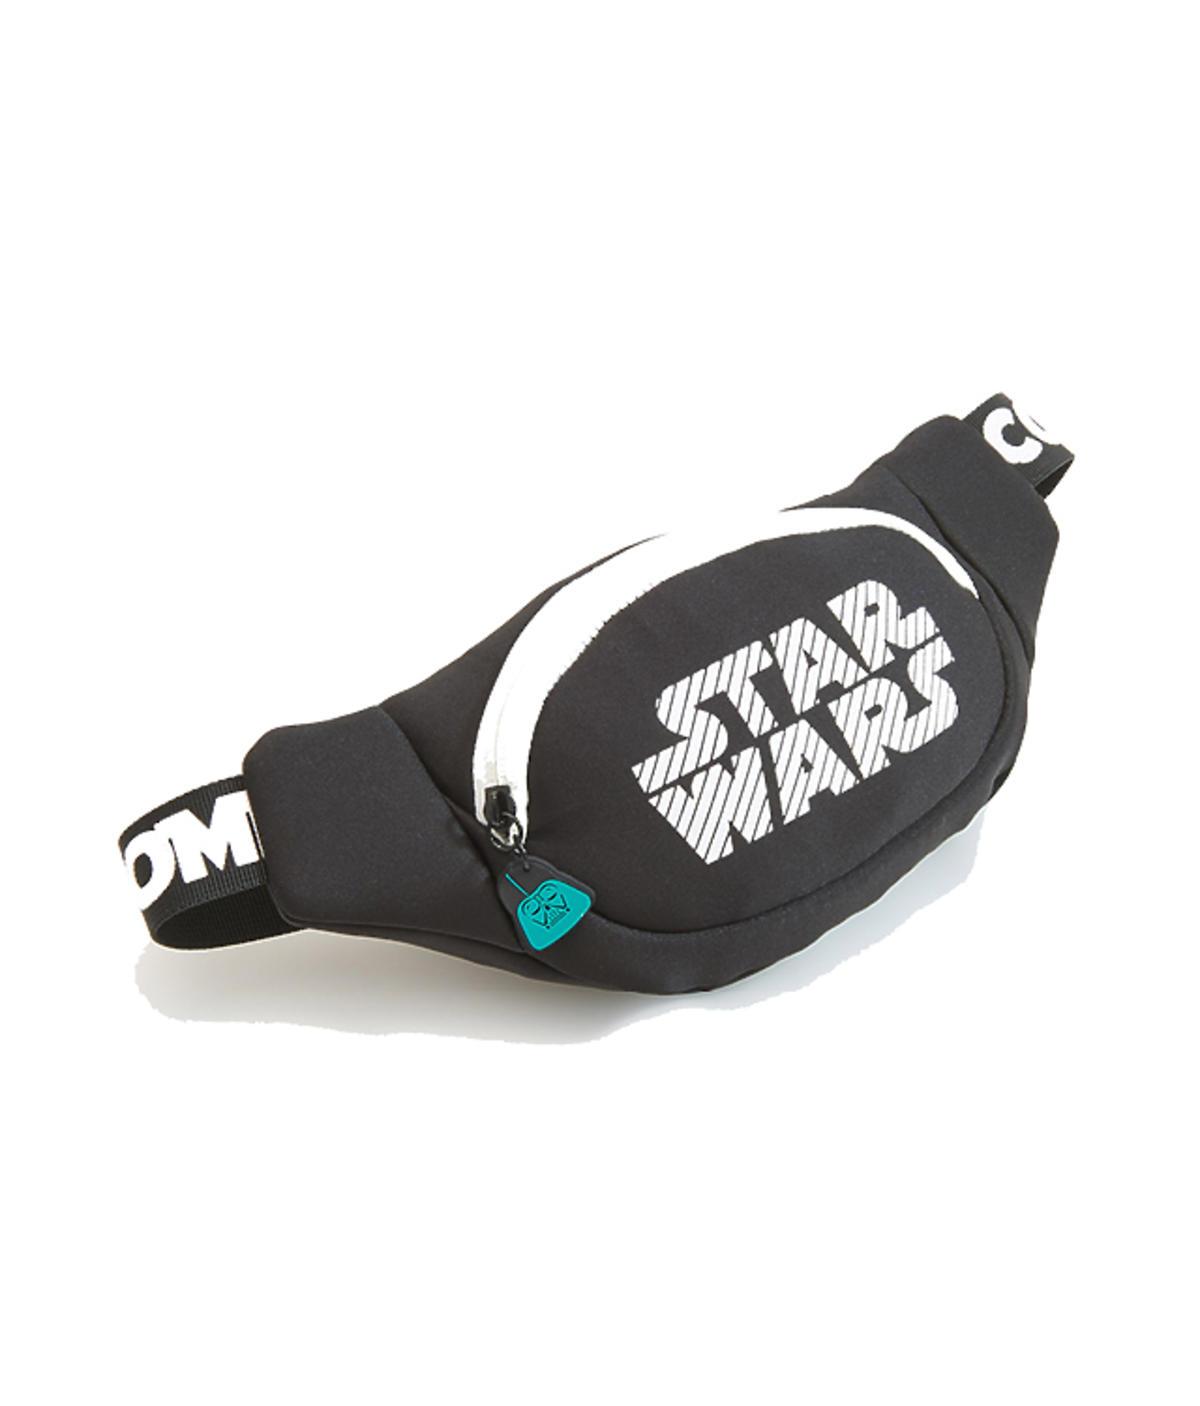 Nerka Star Wars, Reserved, 39,99 zł